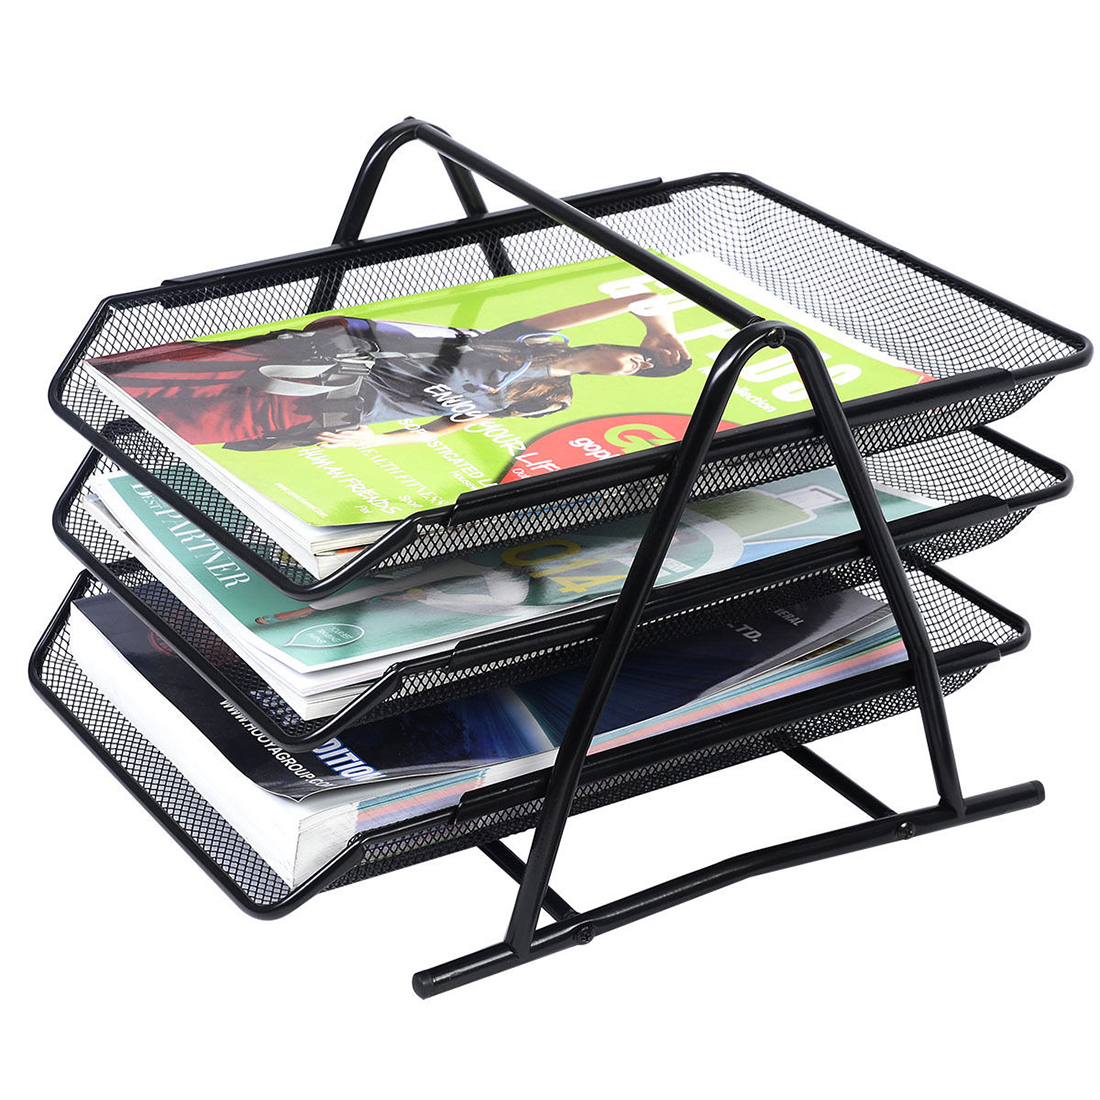 BLEL Hot Office Filing Trays Holder A4 Document Letter Paper Wire Mesh Storage Organiser